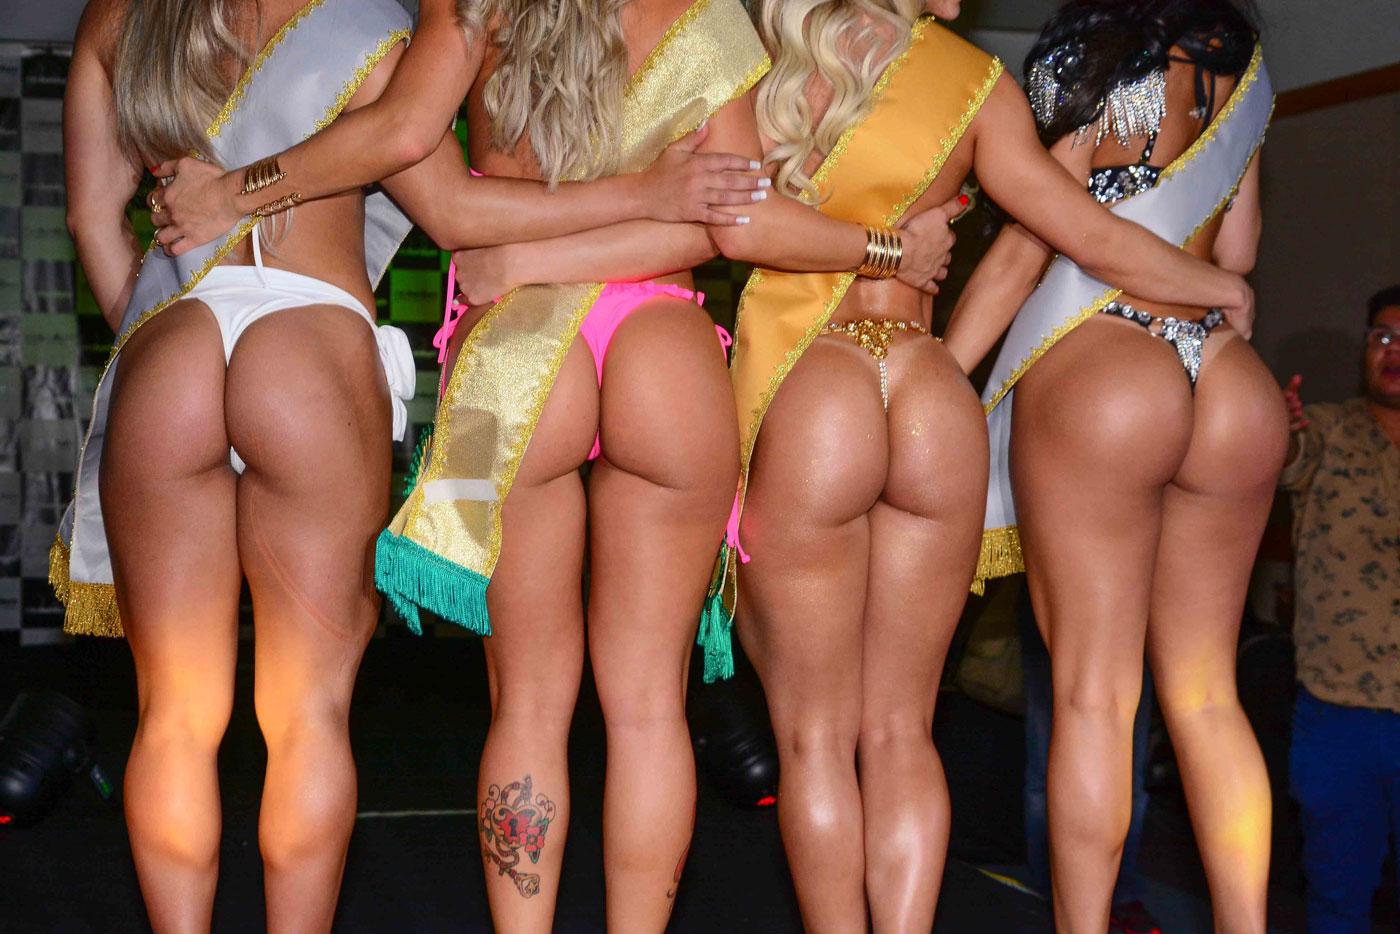 Трахнул огромную бразильскую попу